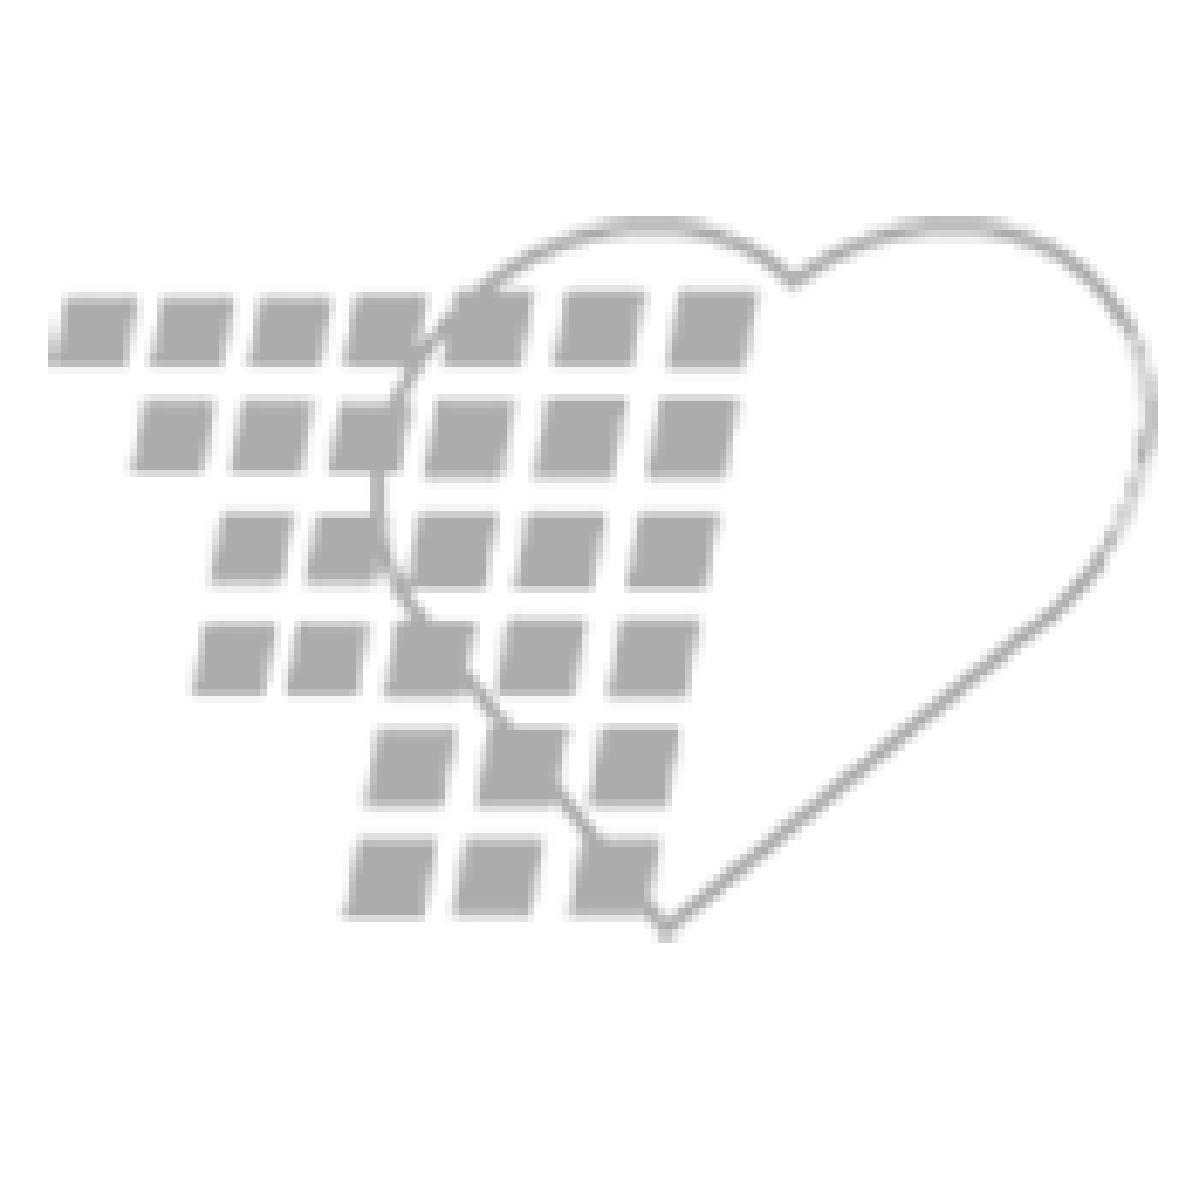 06-21-502 Multi-Sample (Blood Draw) Needle